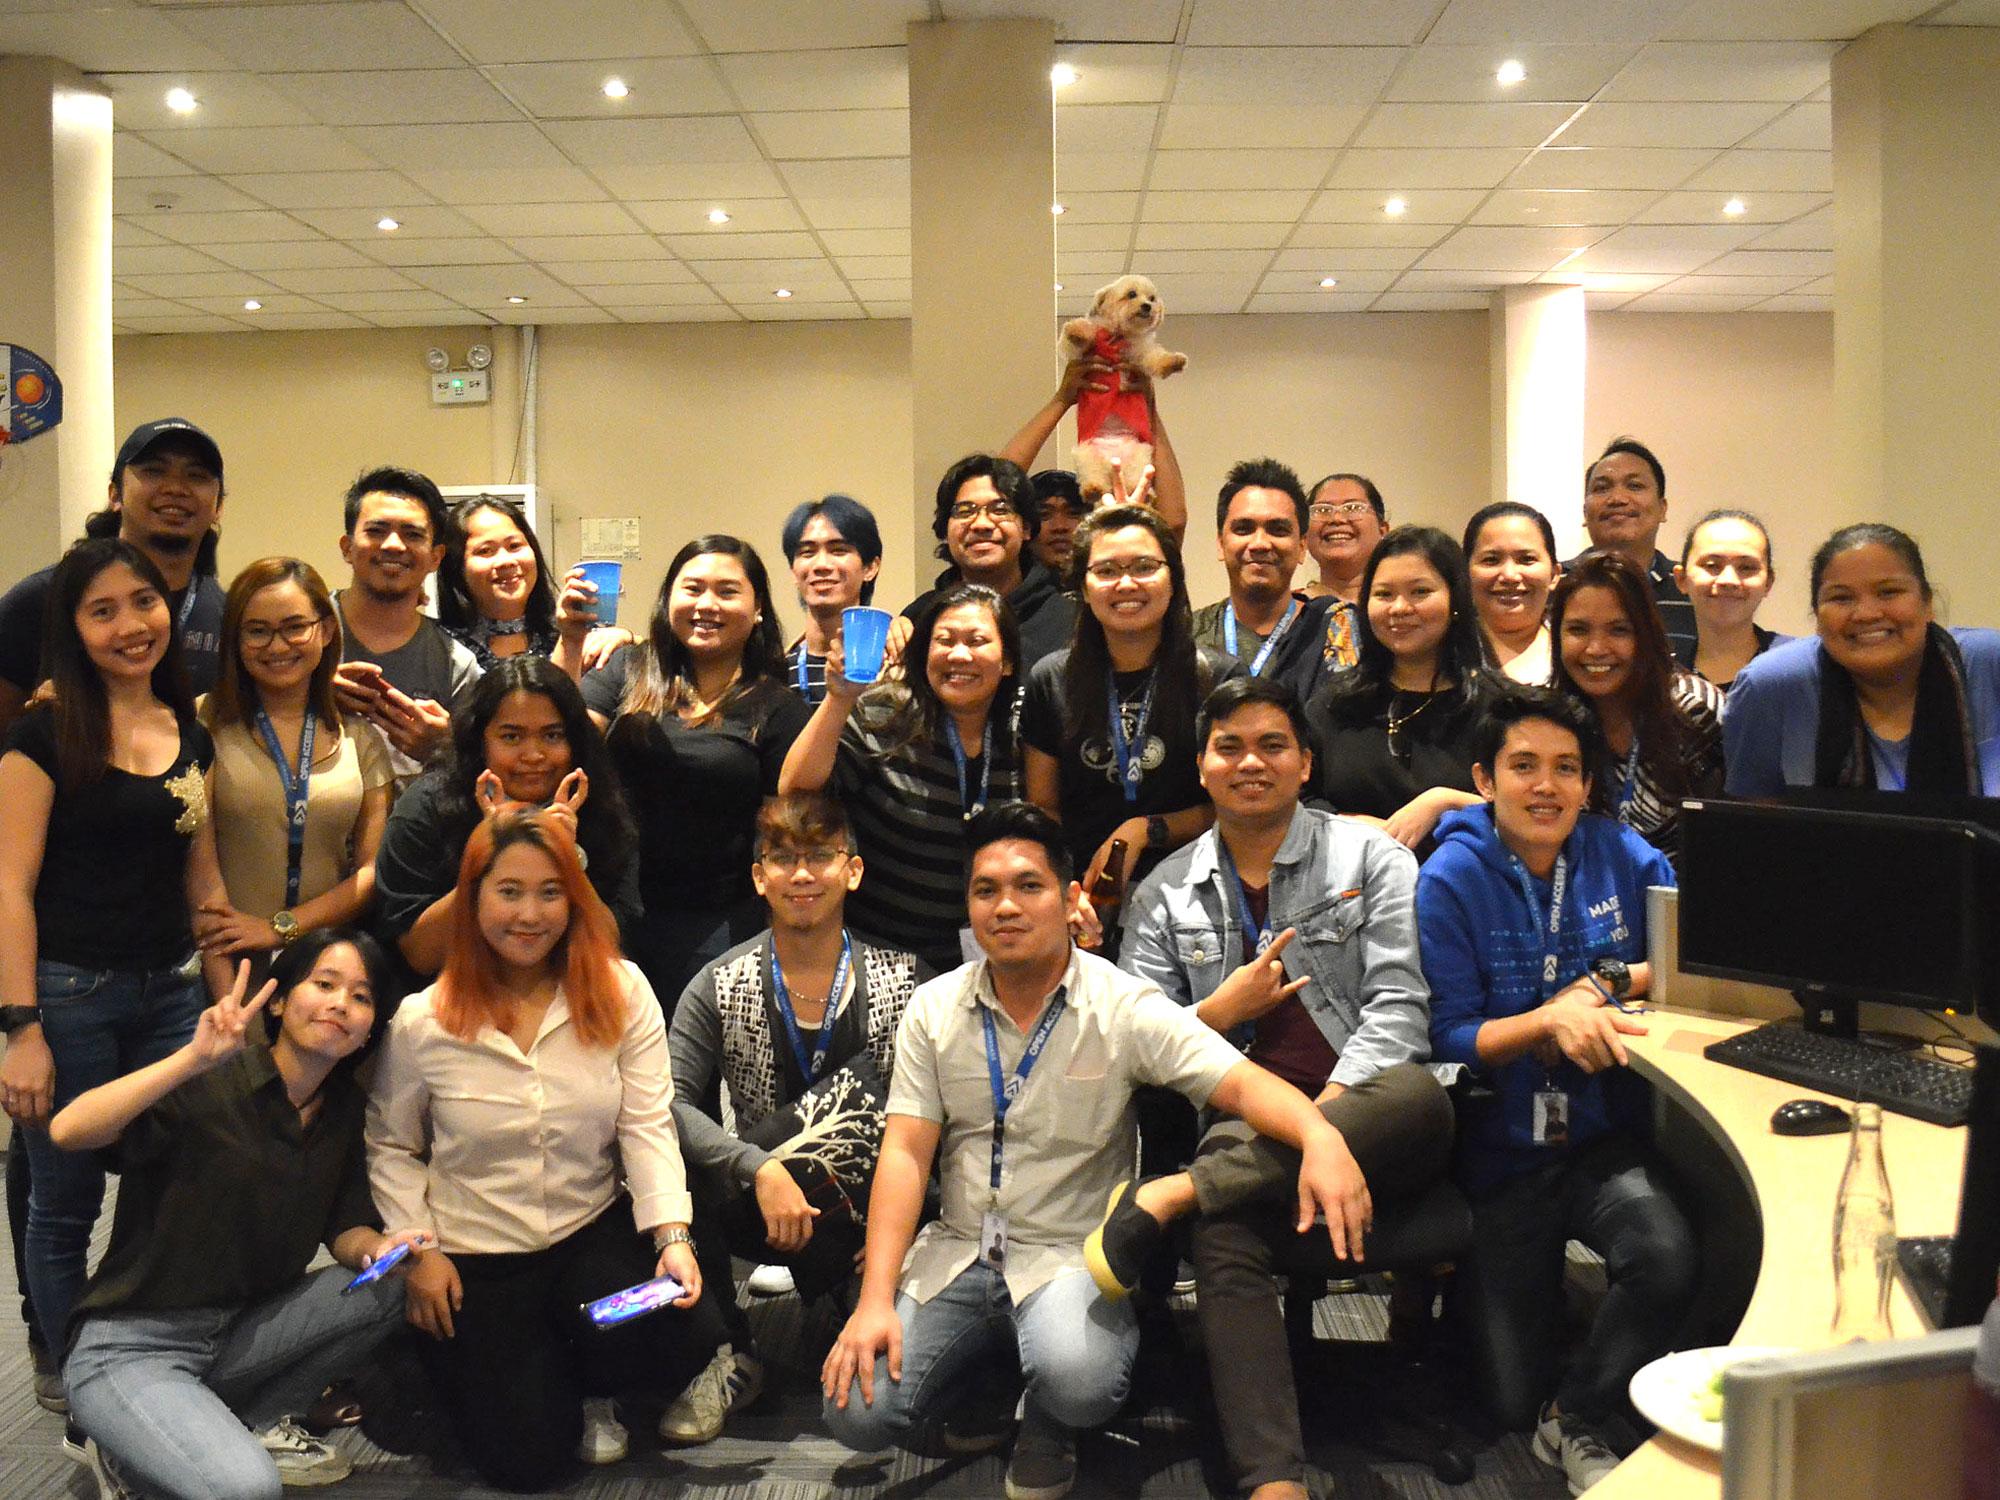 https://www.openaccessbpo.com/wp-content/uploads/2021/09/Open-Access-BPO-Davao-1.jpg